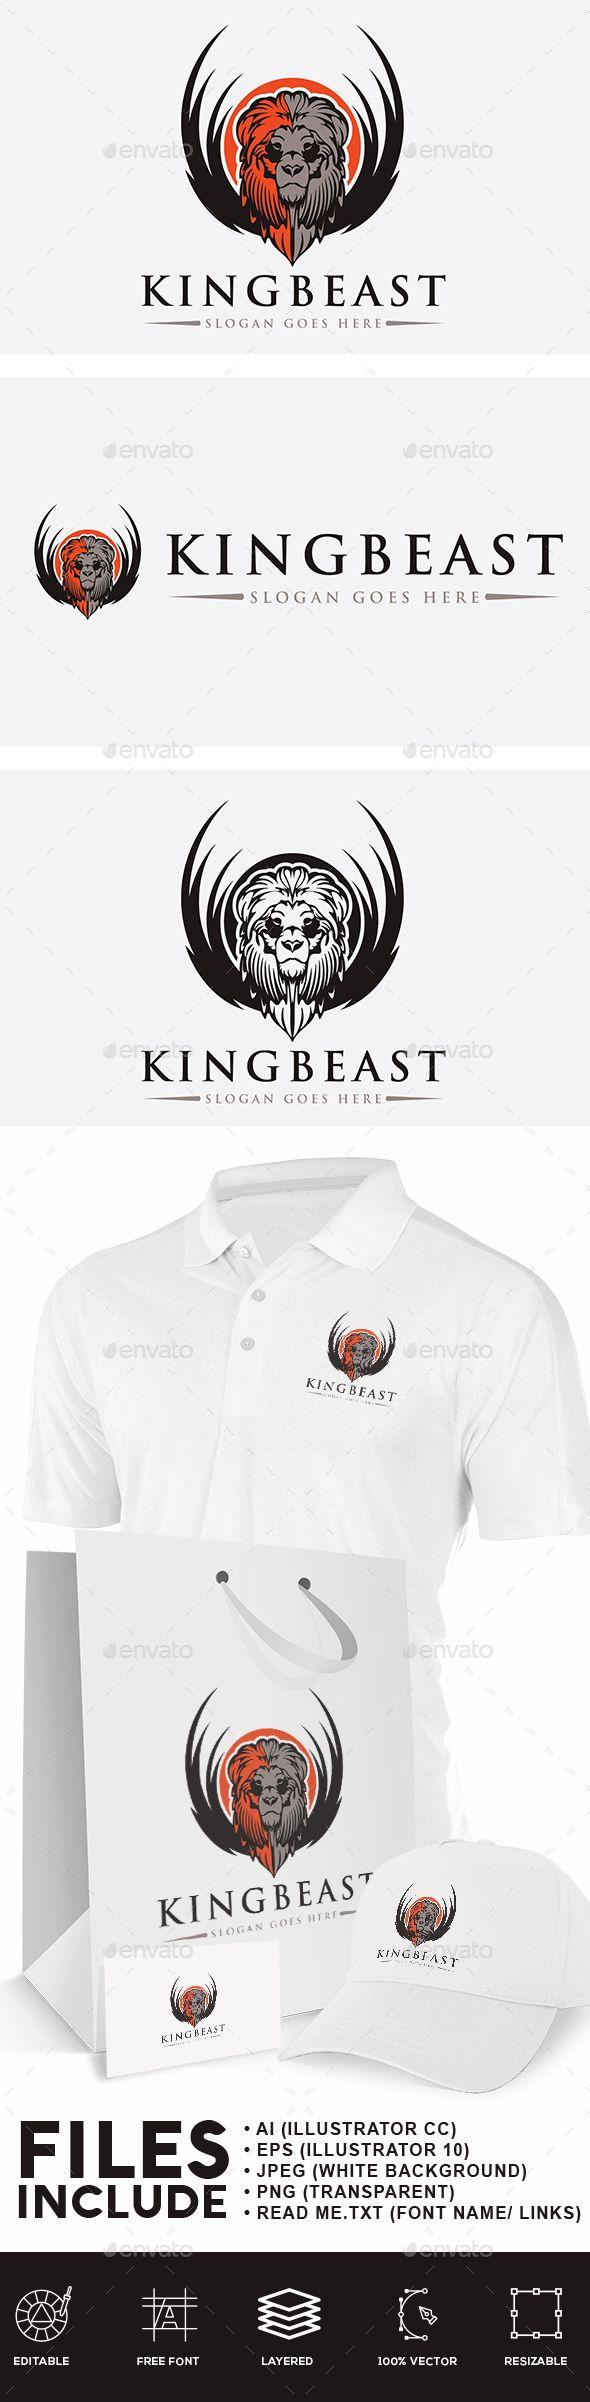 King Beast Logo